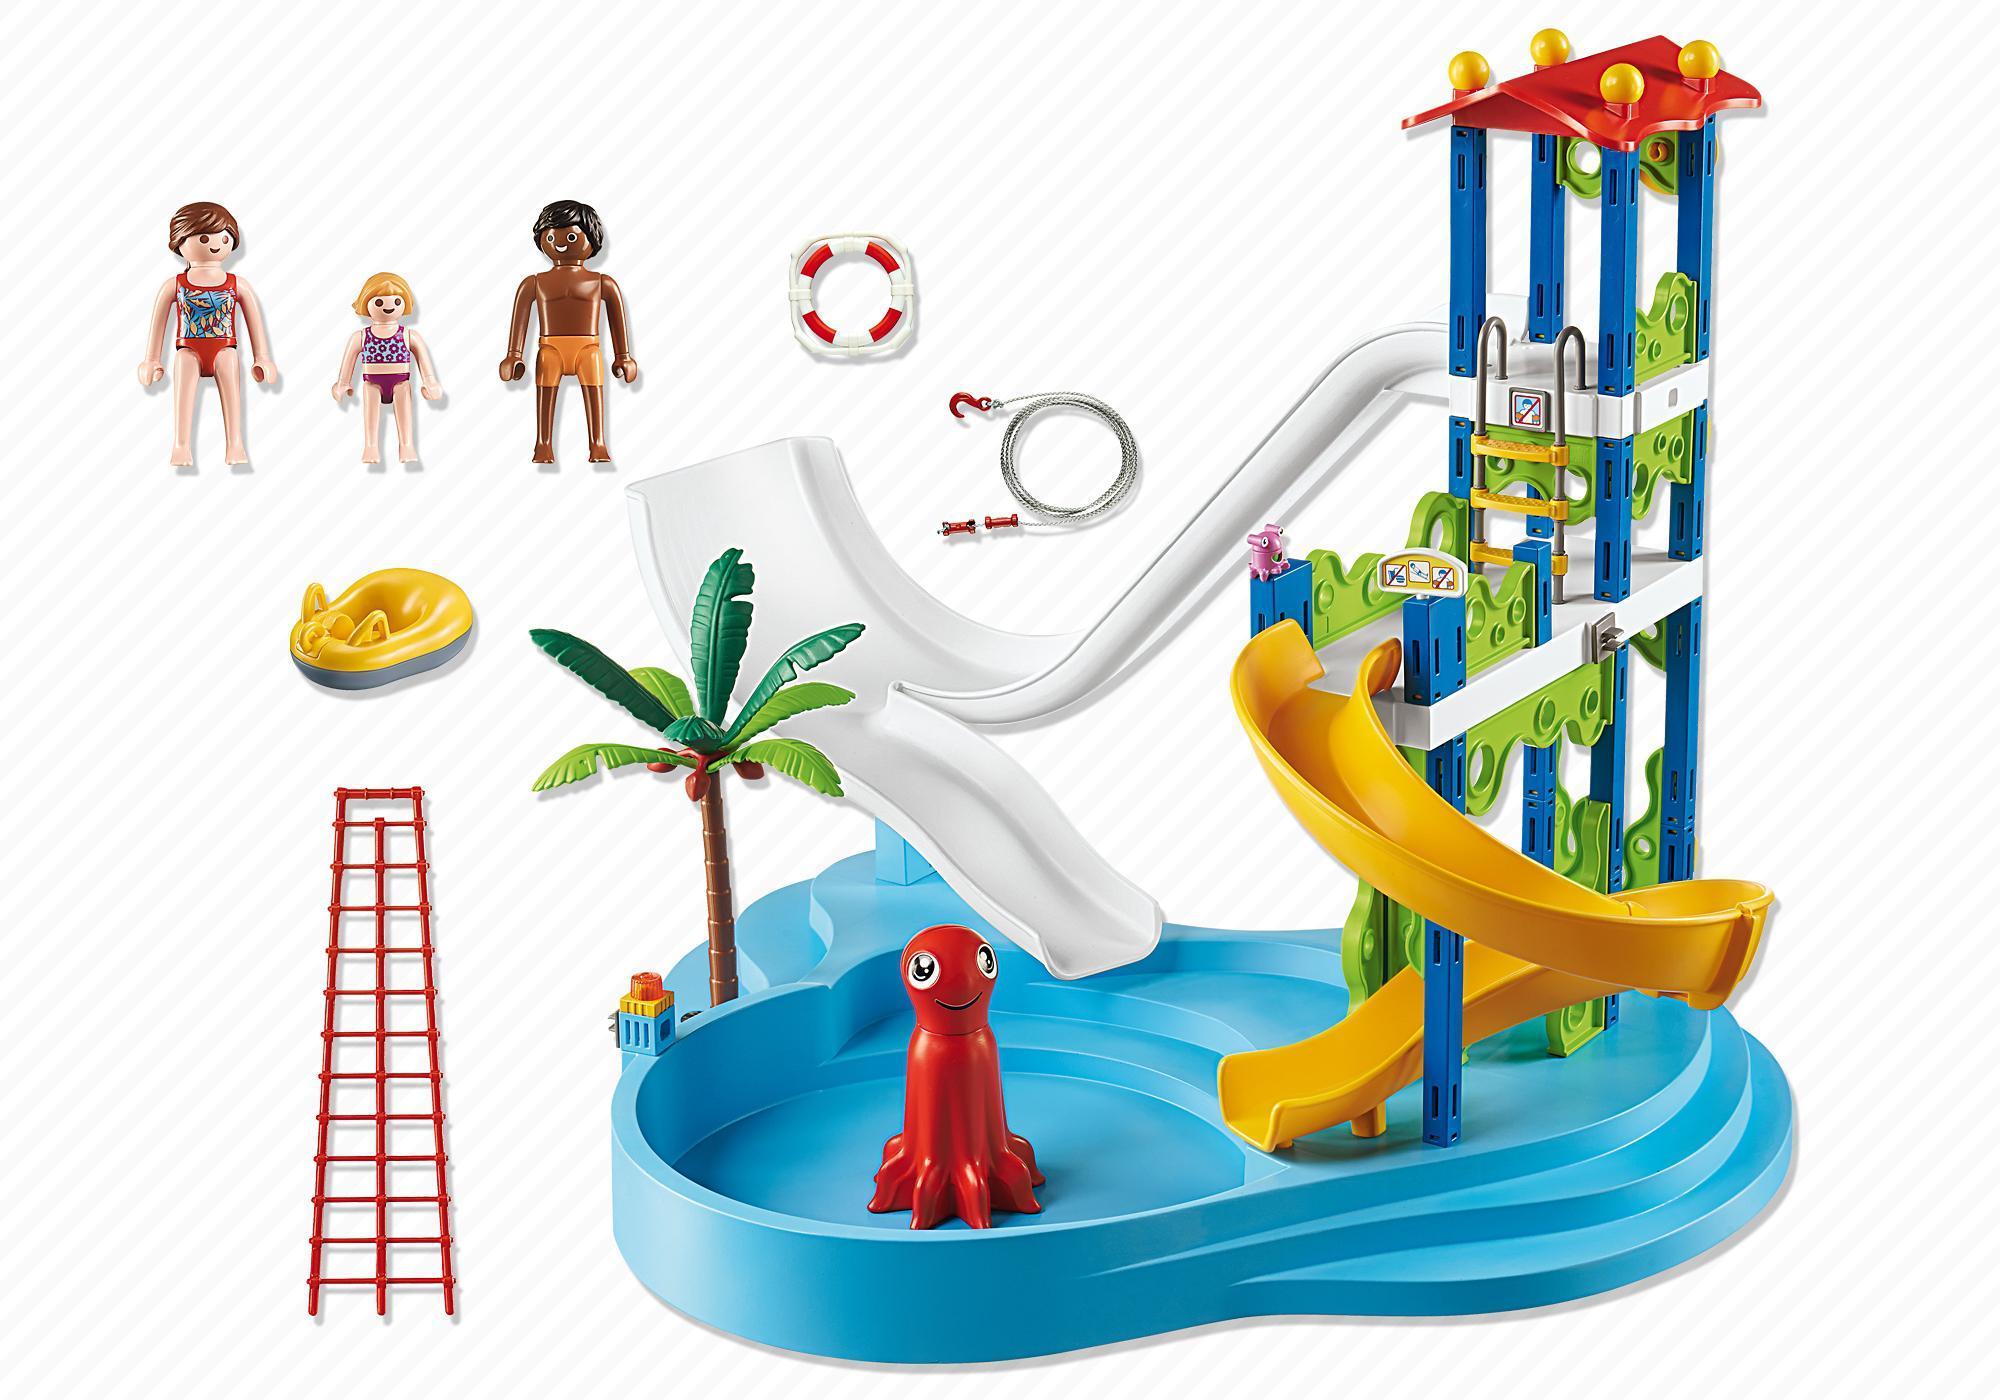 http://media.playmobil.com/i/playmobil/6669_product_box_back/Parque Acuático con Toboganes